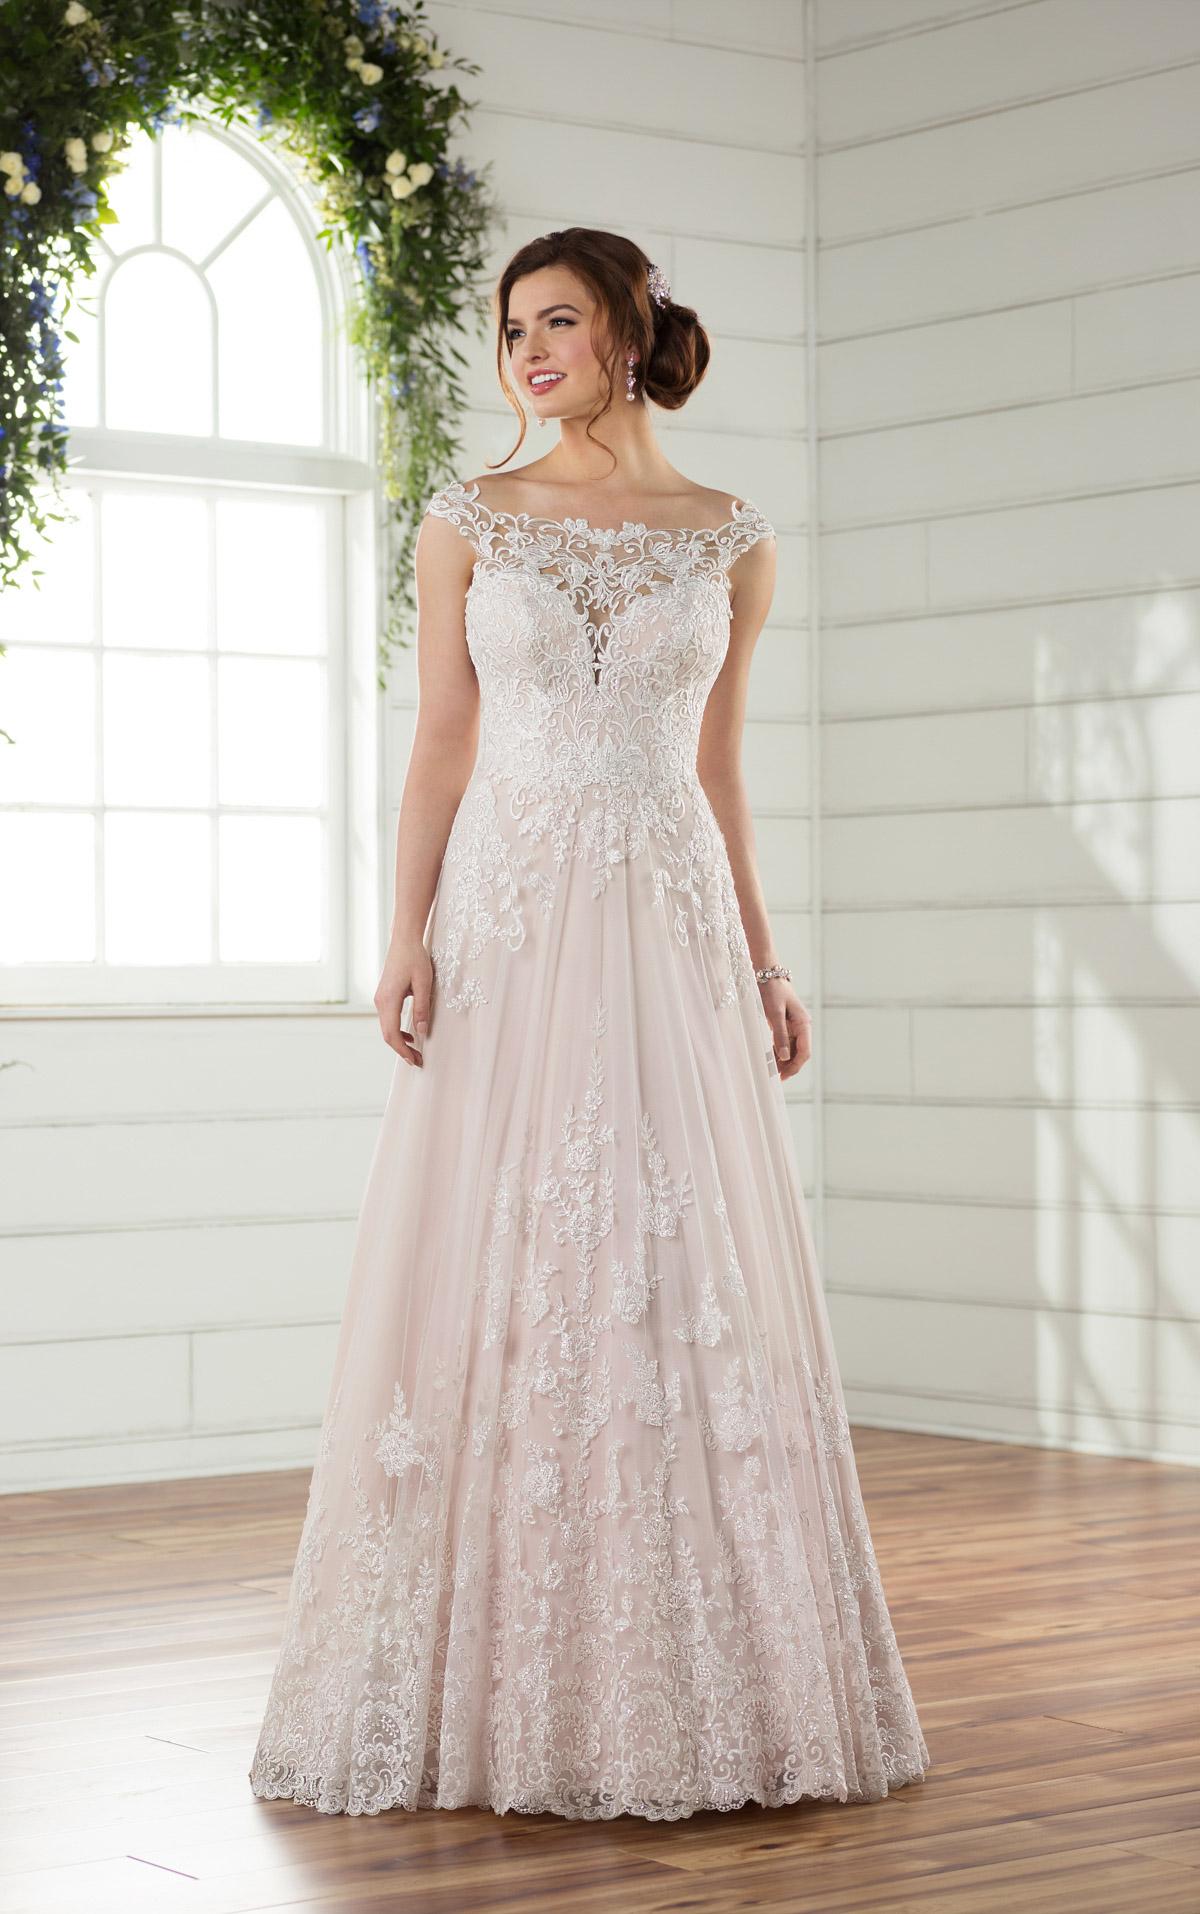 fc0fd5507f89e Satin Wedding Dress With Lace Overlay - raveitsafe